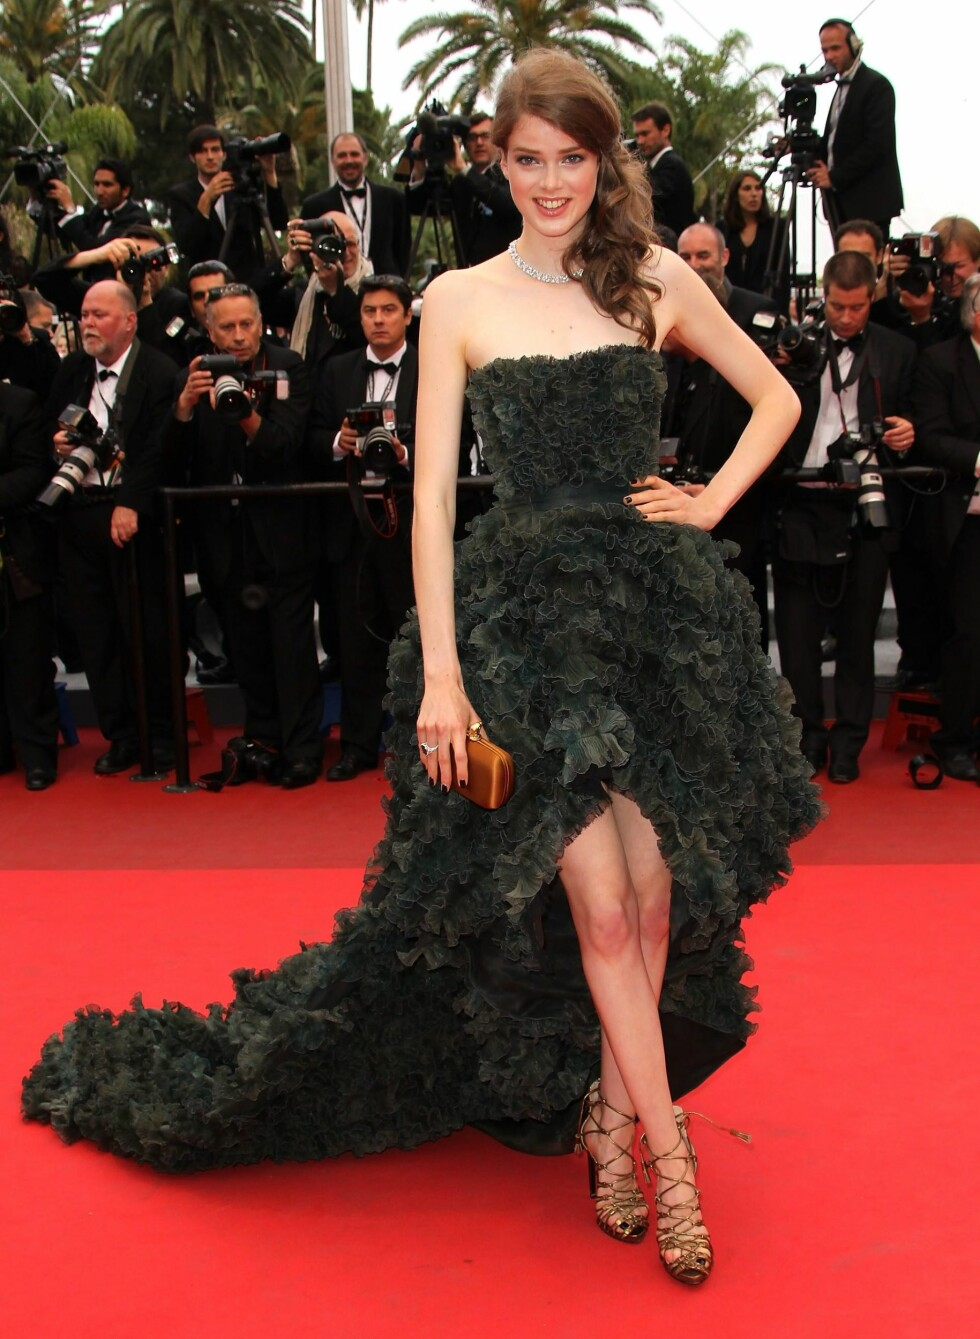 Supermodell Julia Saner på premieren av La Conquete i Cannes, i stroppeløs hockeykjole fra Pucci. Foto: All Over Press